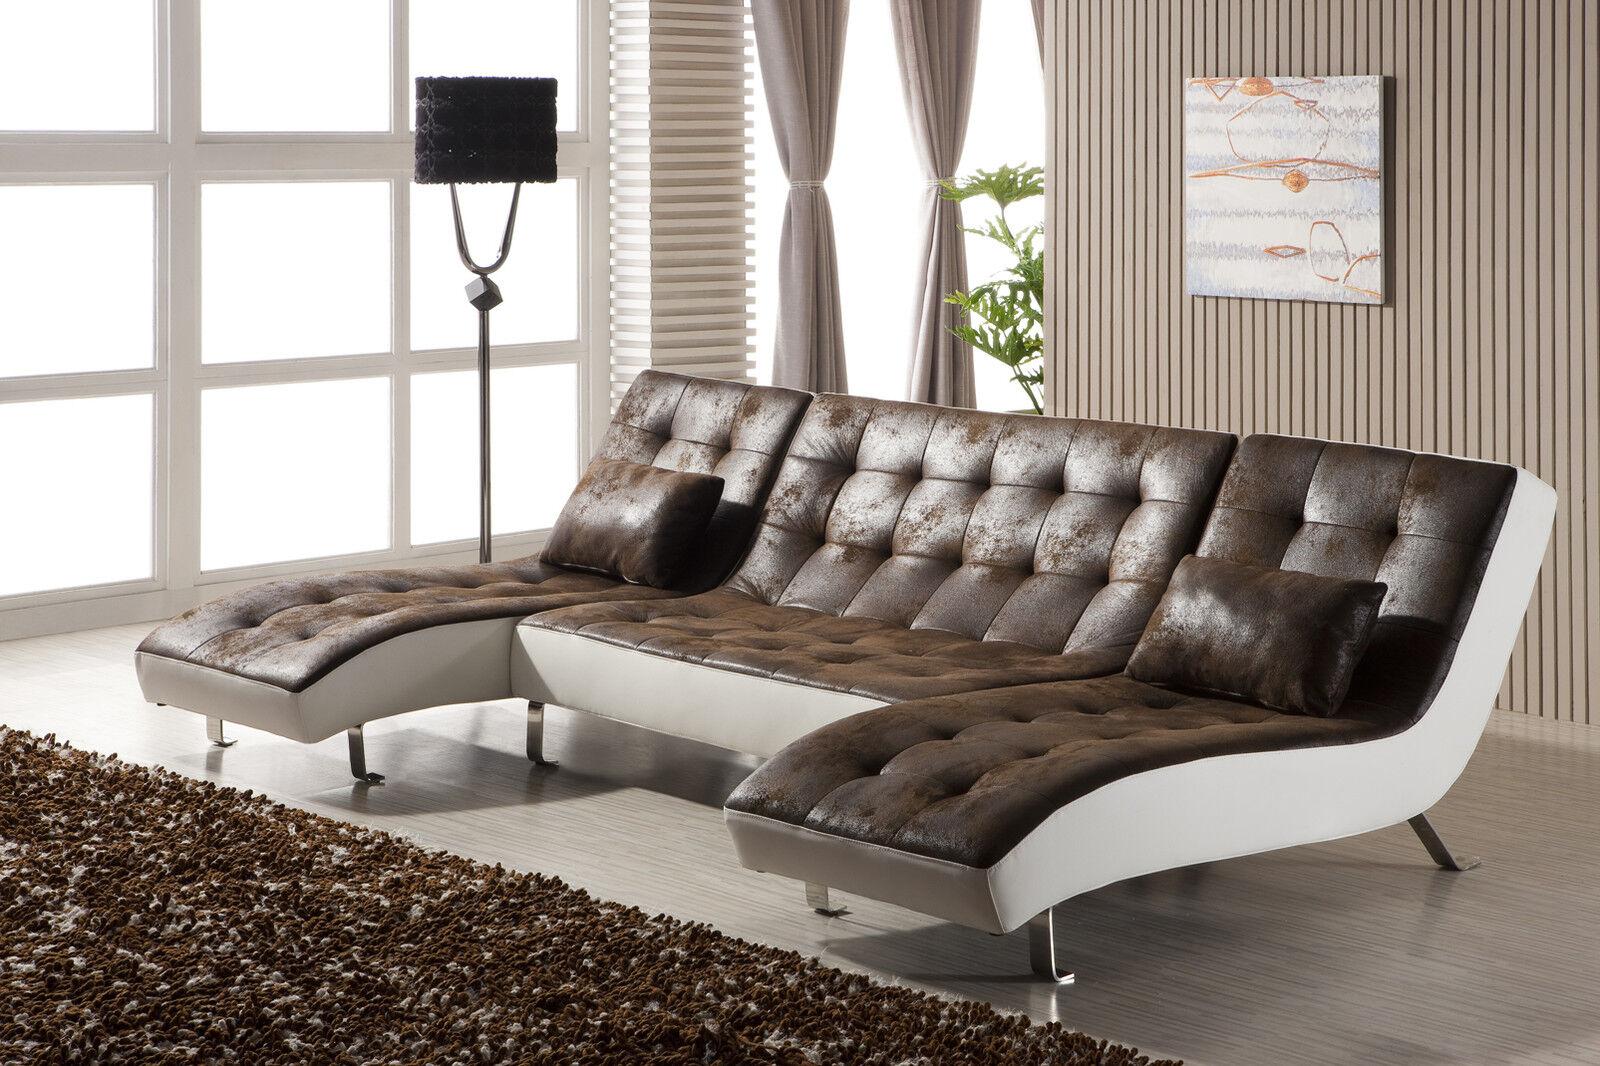 Voll leder couch sofa garnitur relaxsessel fernsehsessel for Sofa garnitur